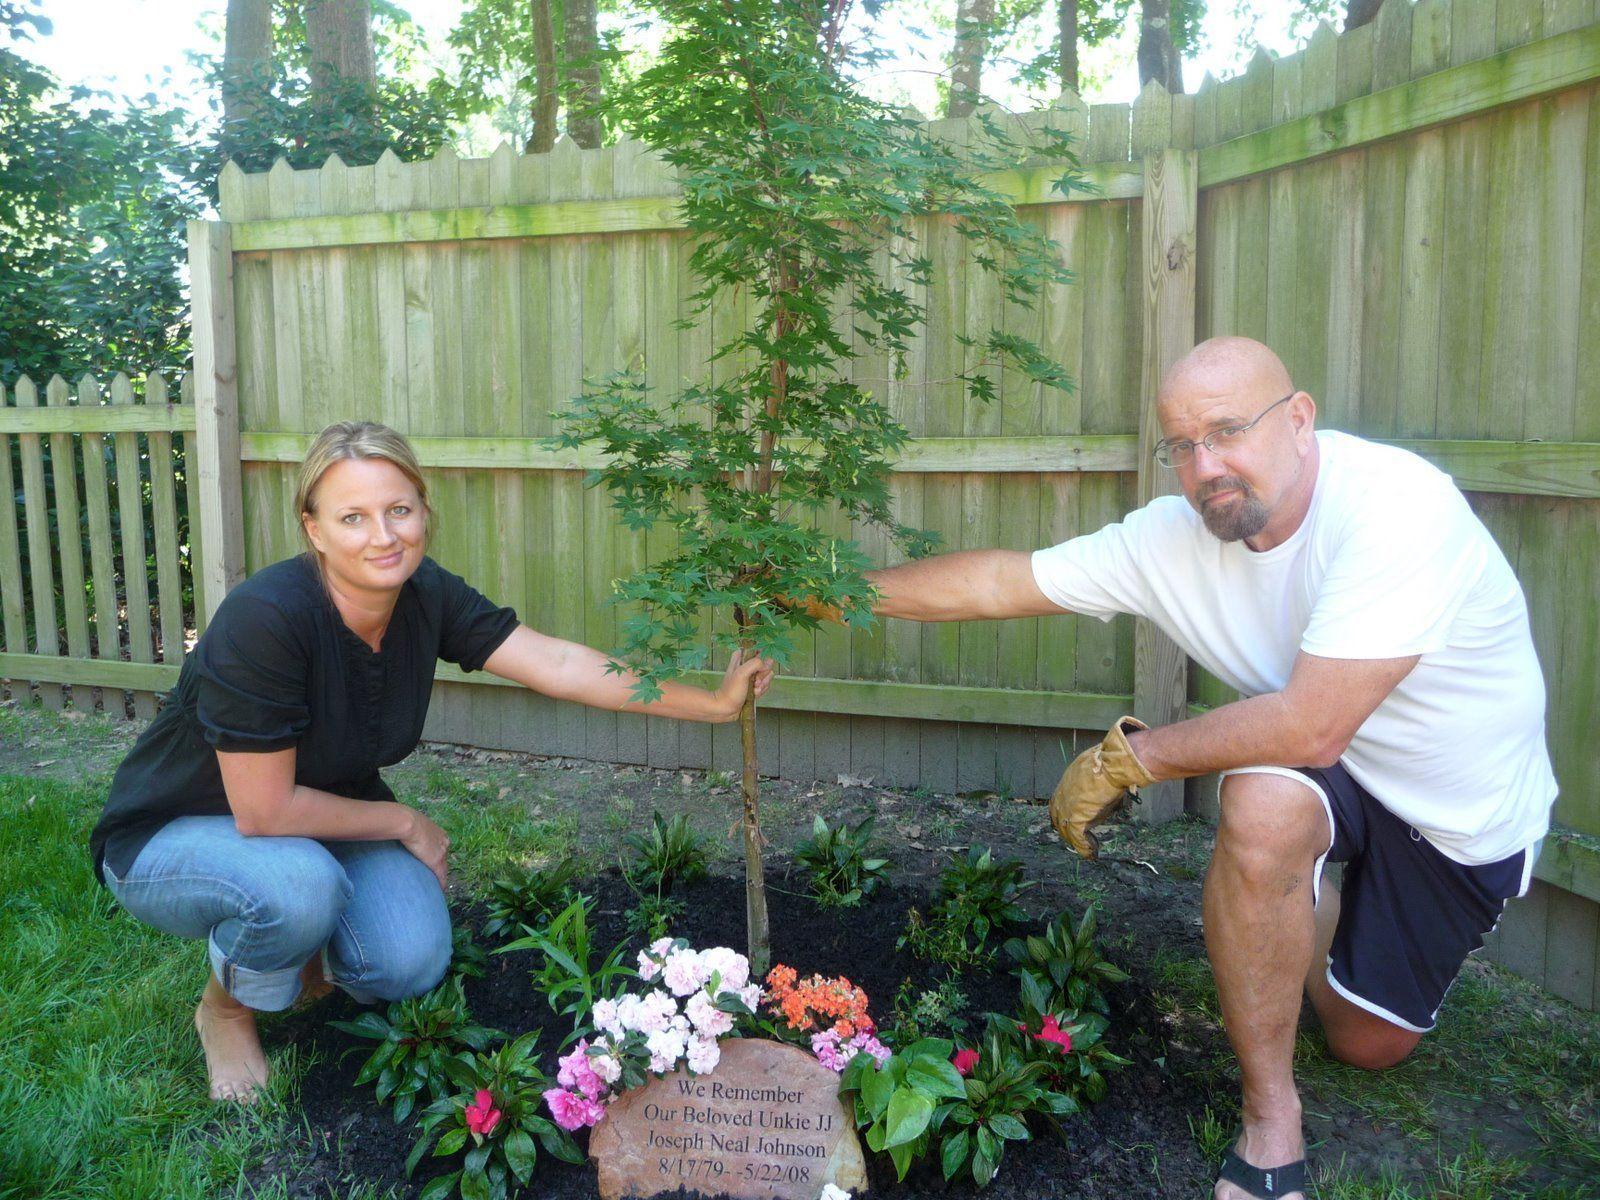 10 Memorial Flower Garden Ideas Most Amazing As Well As Beautiful Pet Memorial Garden Memorial Garden Memorial Flowers Backyard diy memorial garden